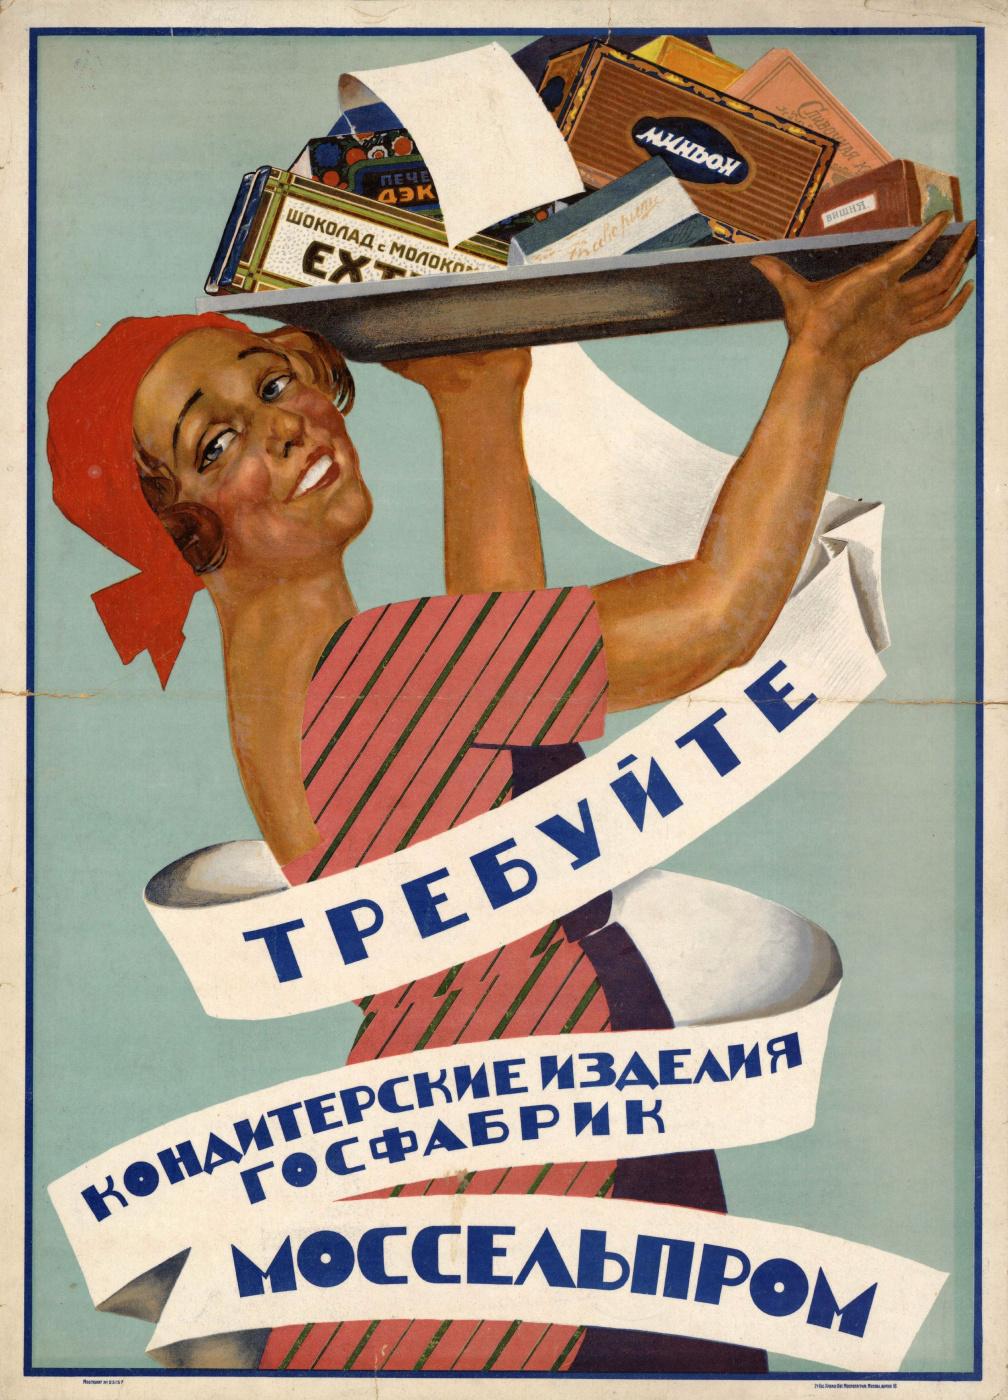 Unknown artist. Mosselprom. Require pastry gasparik